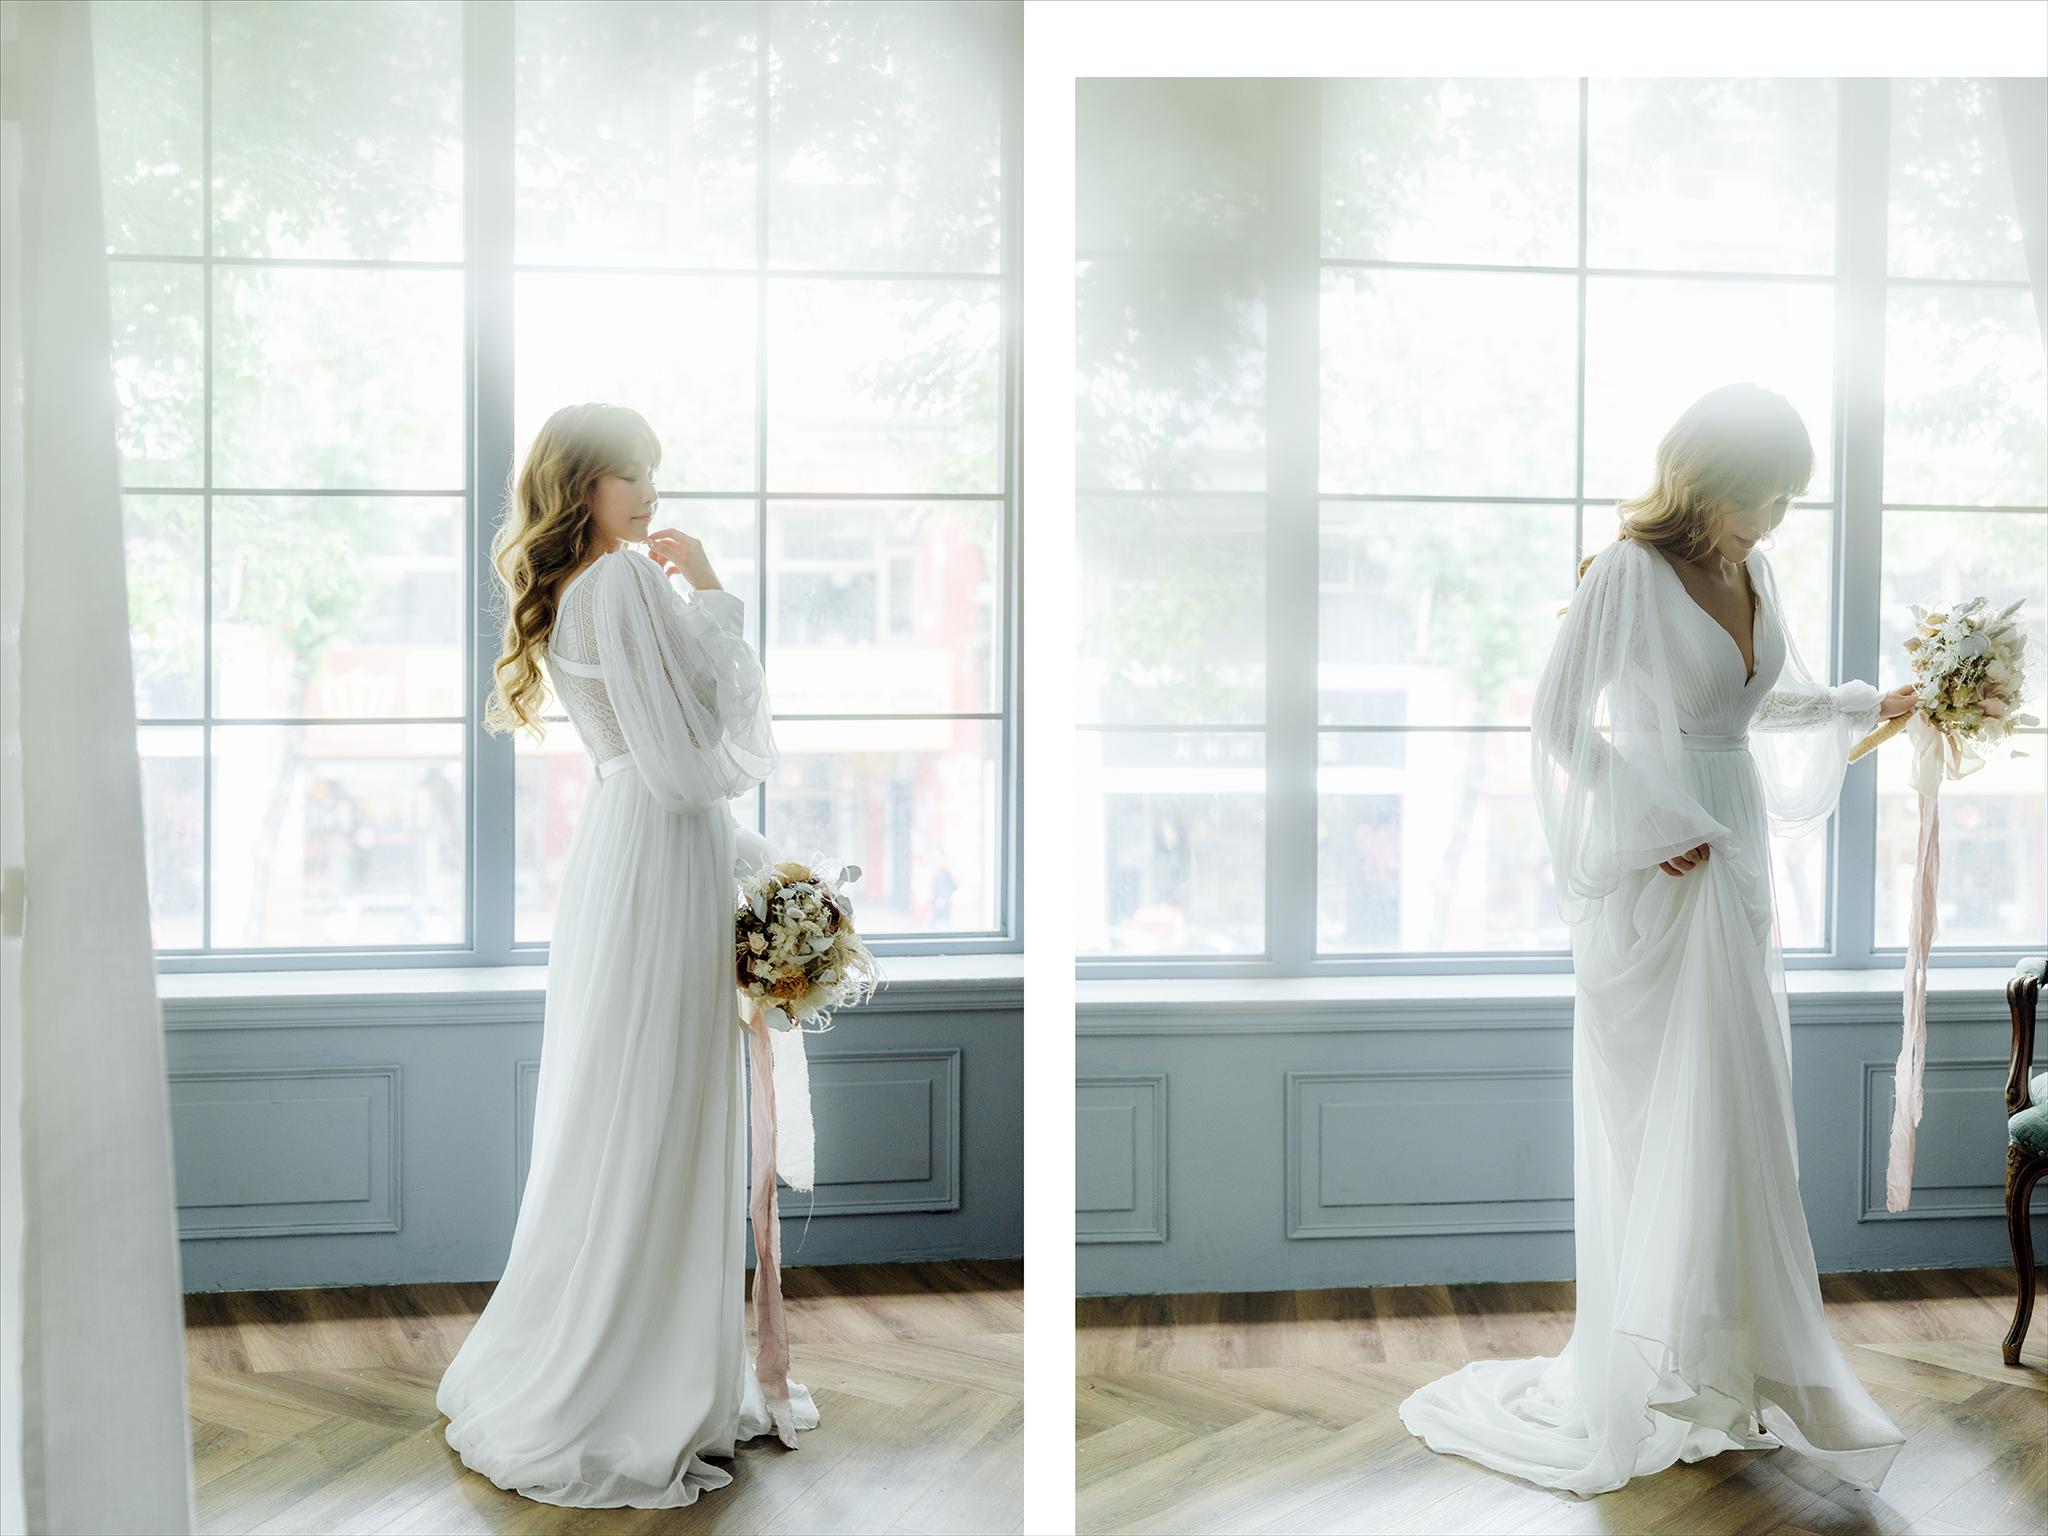 49905195173 f68cf4af38 o - 【自主婚紗】+Sharon+